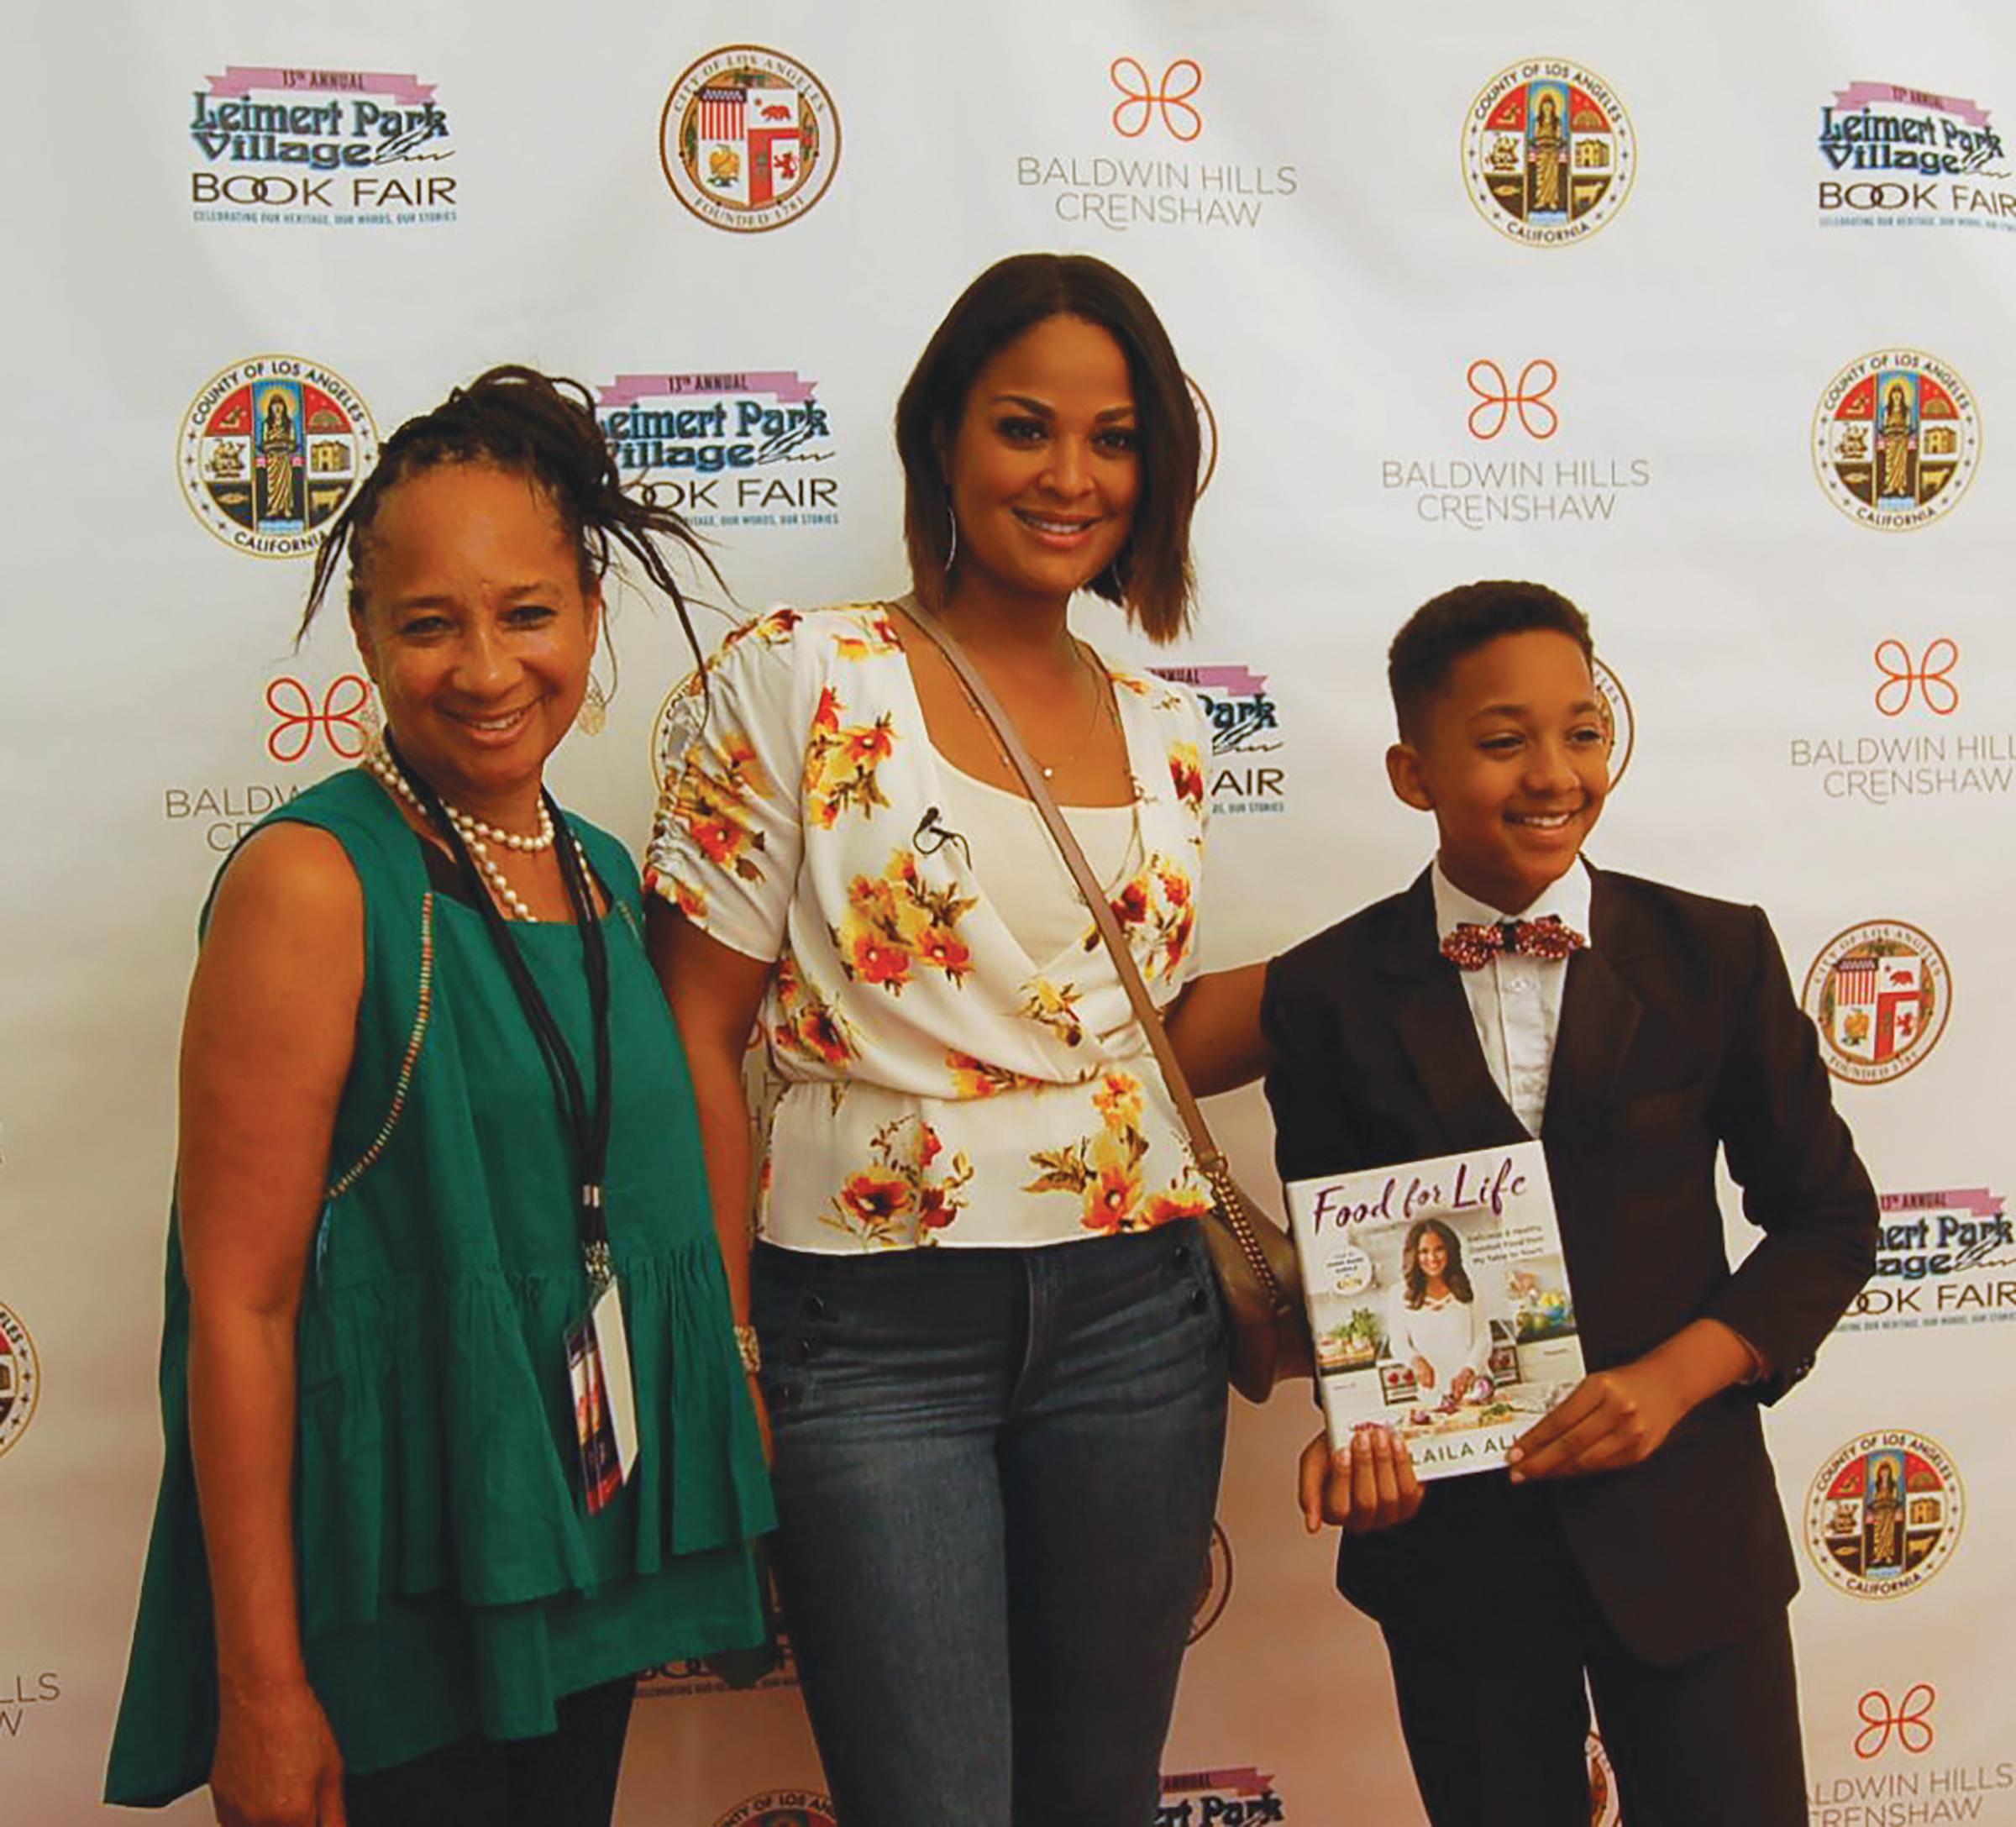 Cynthia Exum, Founder and Executive Director (Leimert Park Village Book Fair, Laila Ali and Brandin Stennis, Actor/Host (Courtesy Photo)